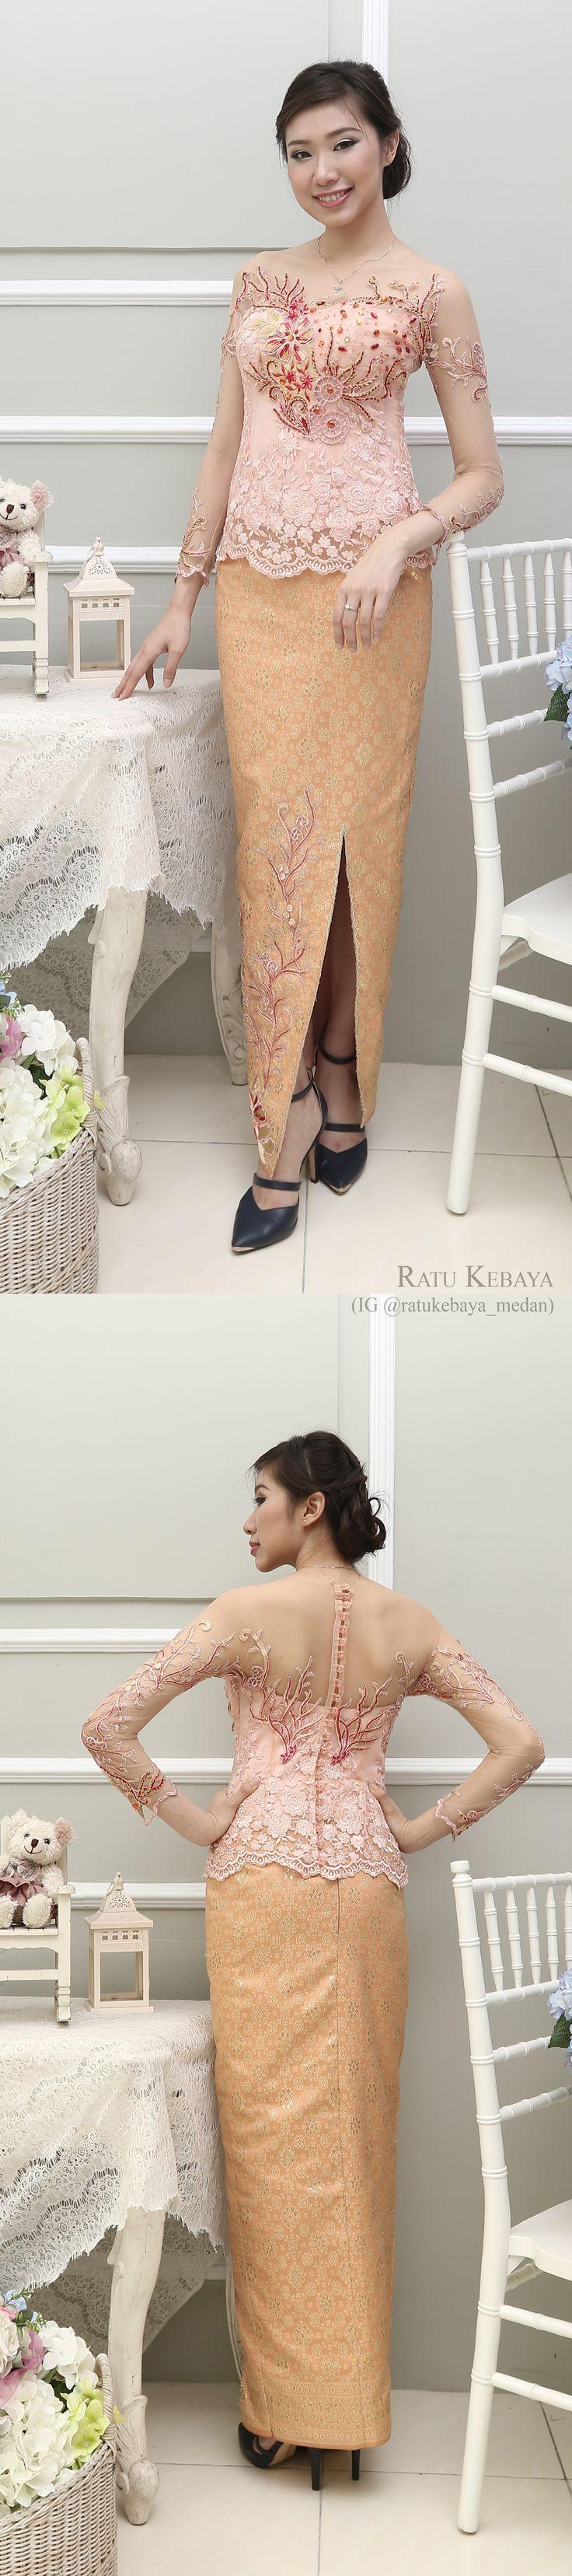 Kebaya @ratukebaya_medan. Padanan lace dan songket